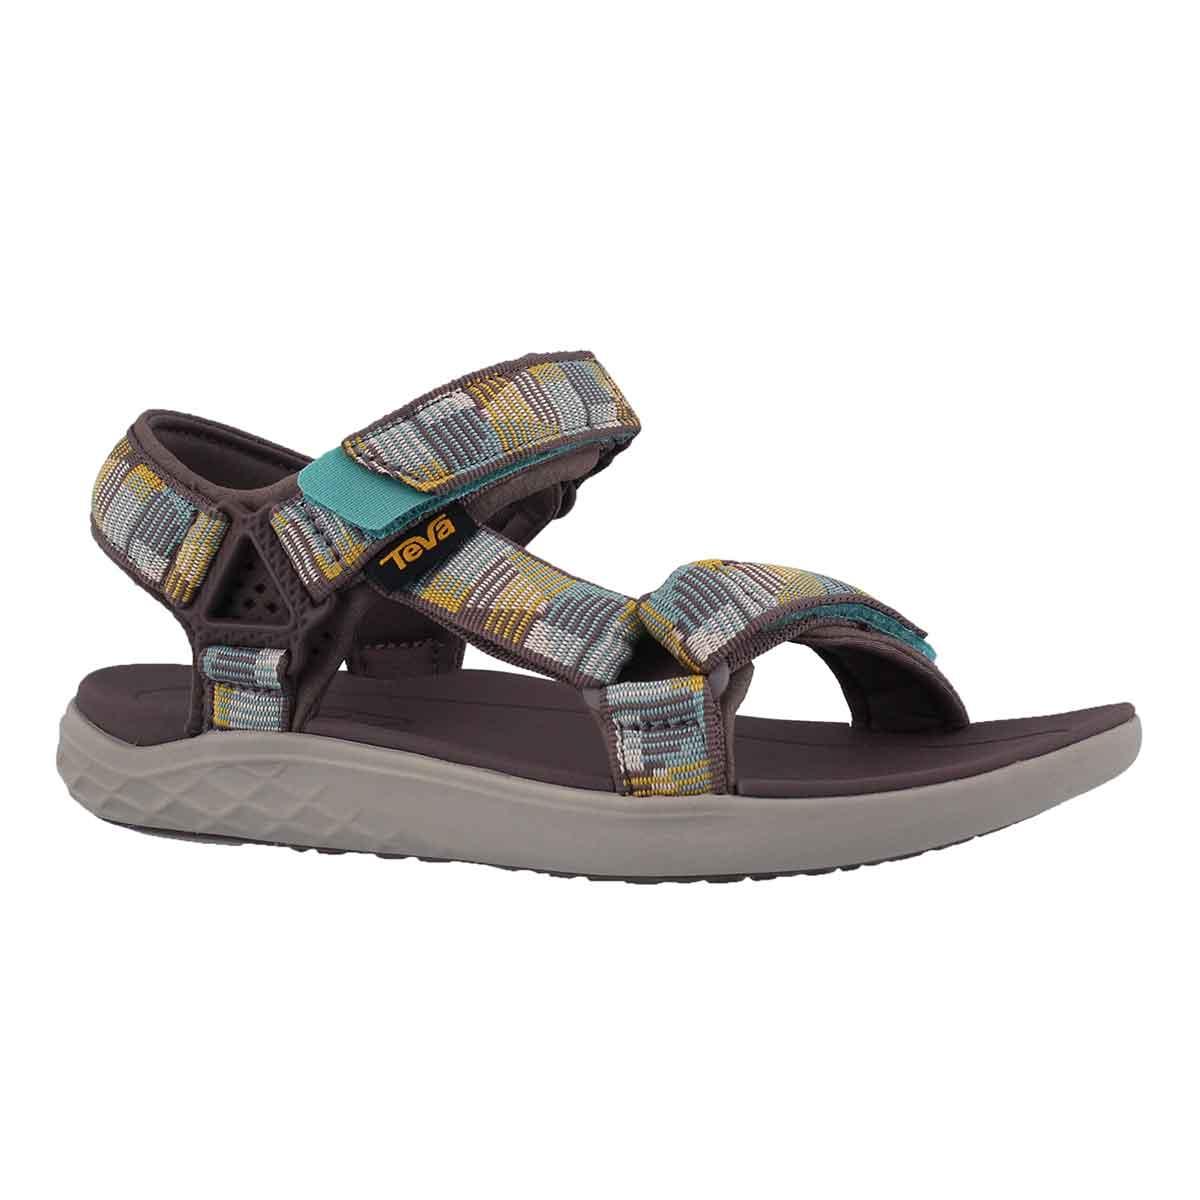 Women's TERRA-FLOAT 2 UNIVERSAL multi sandals